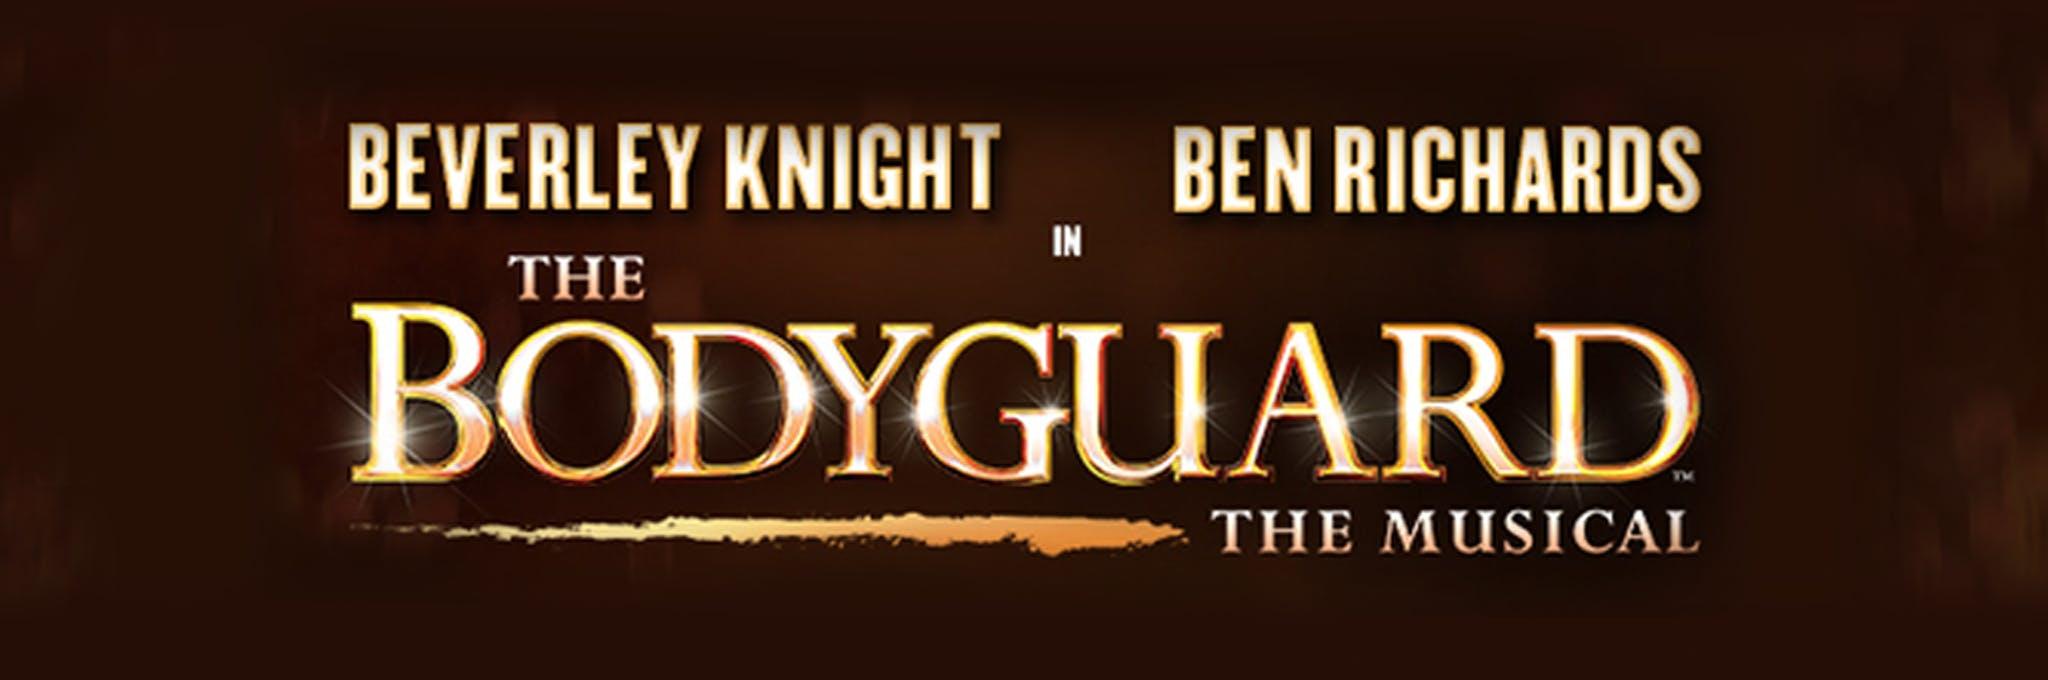 The Bodyguard Logo